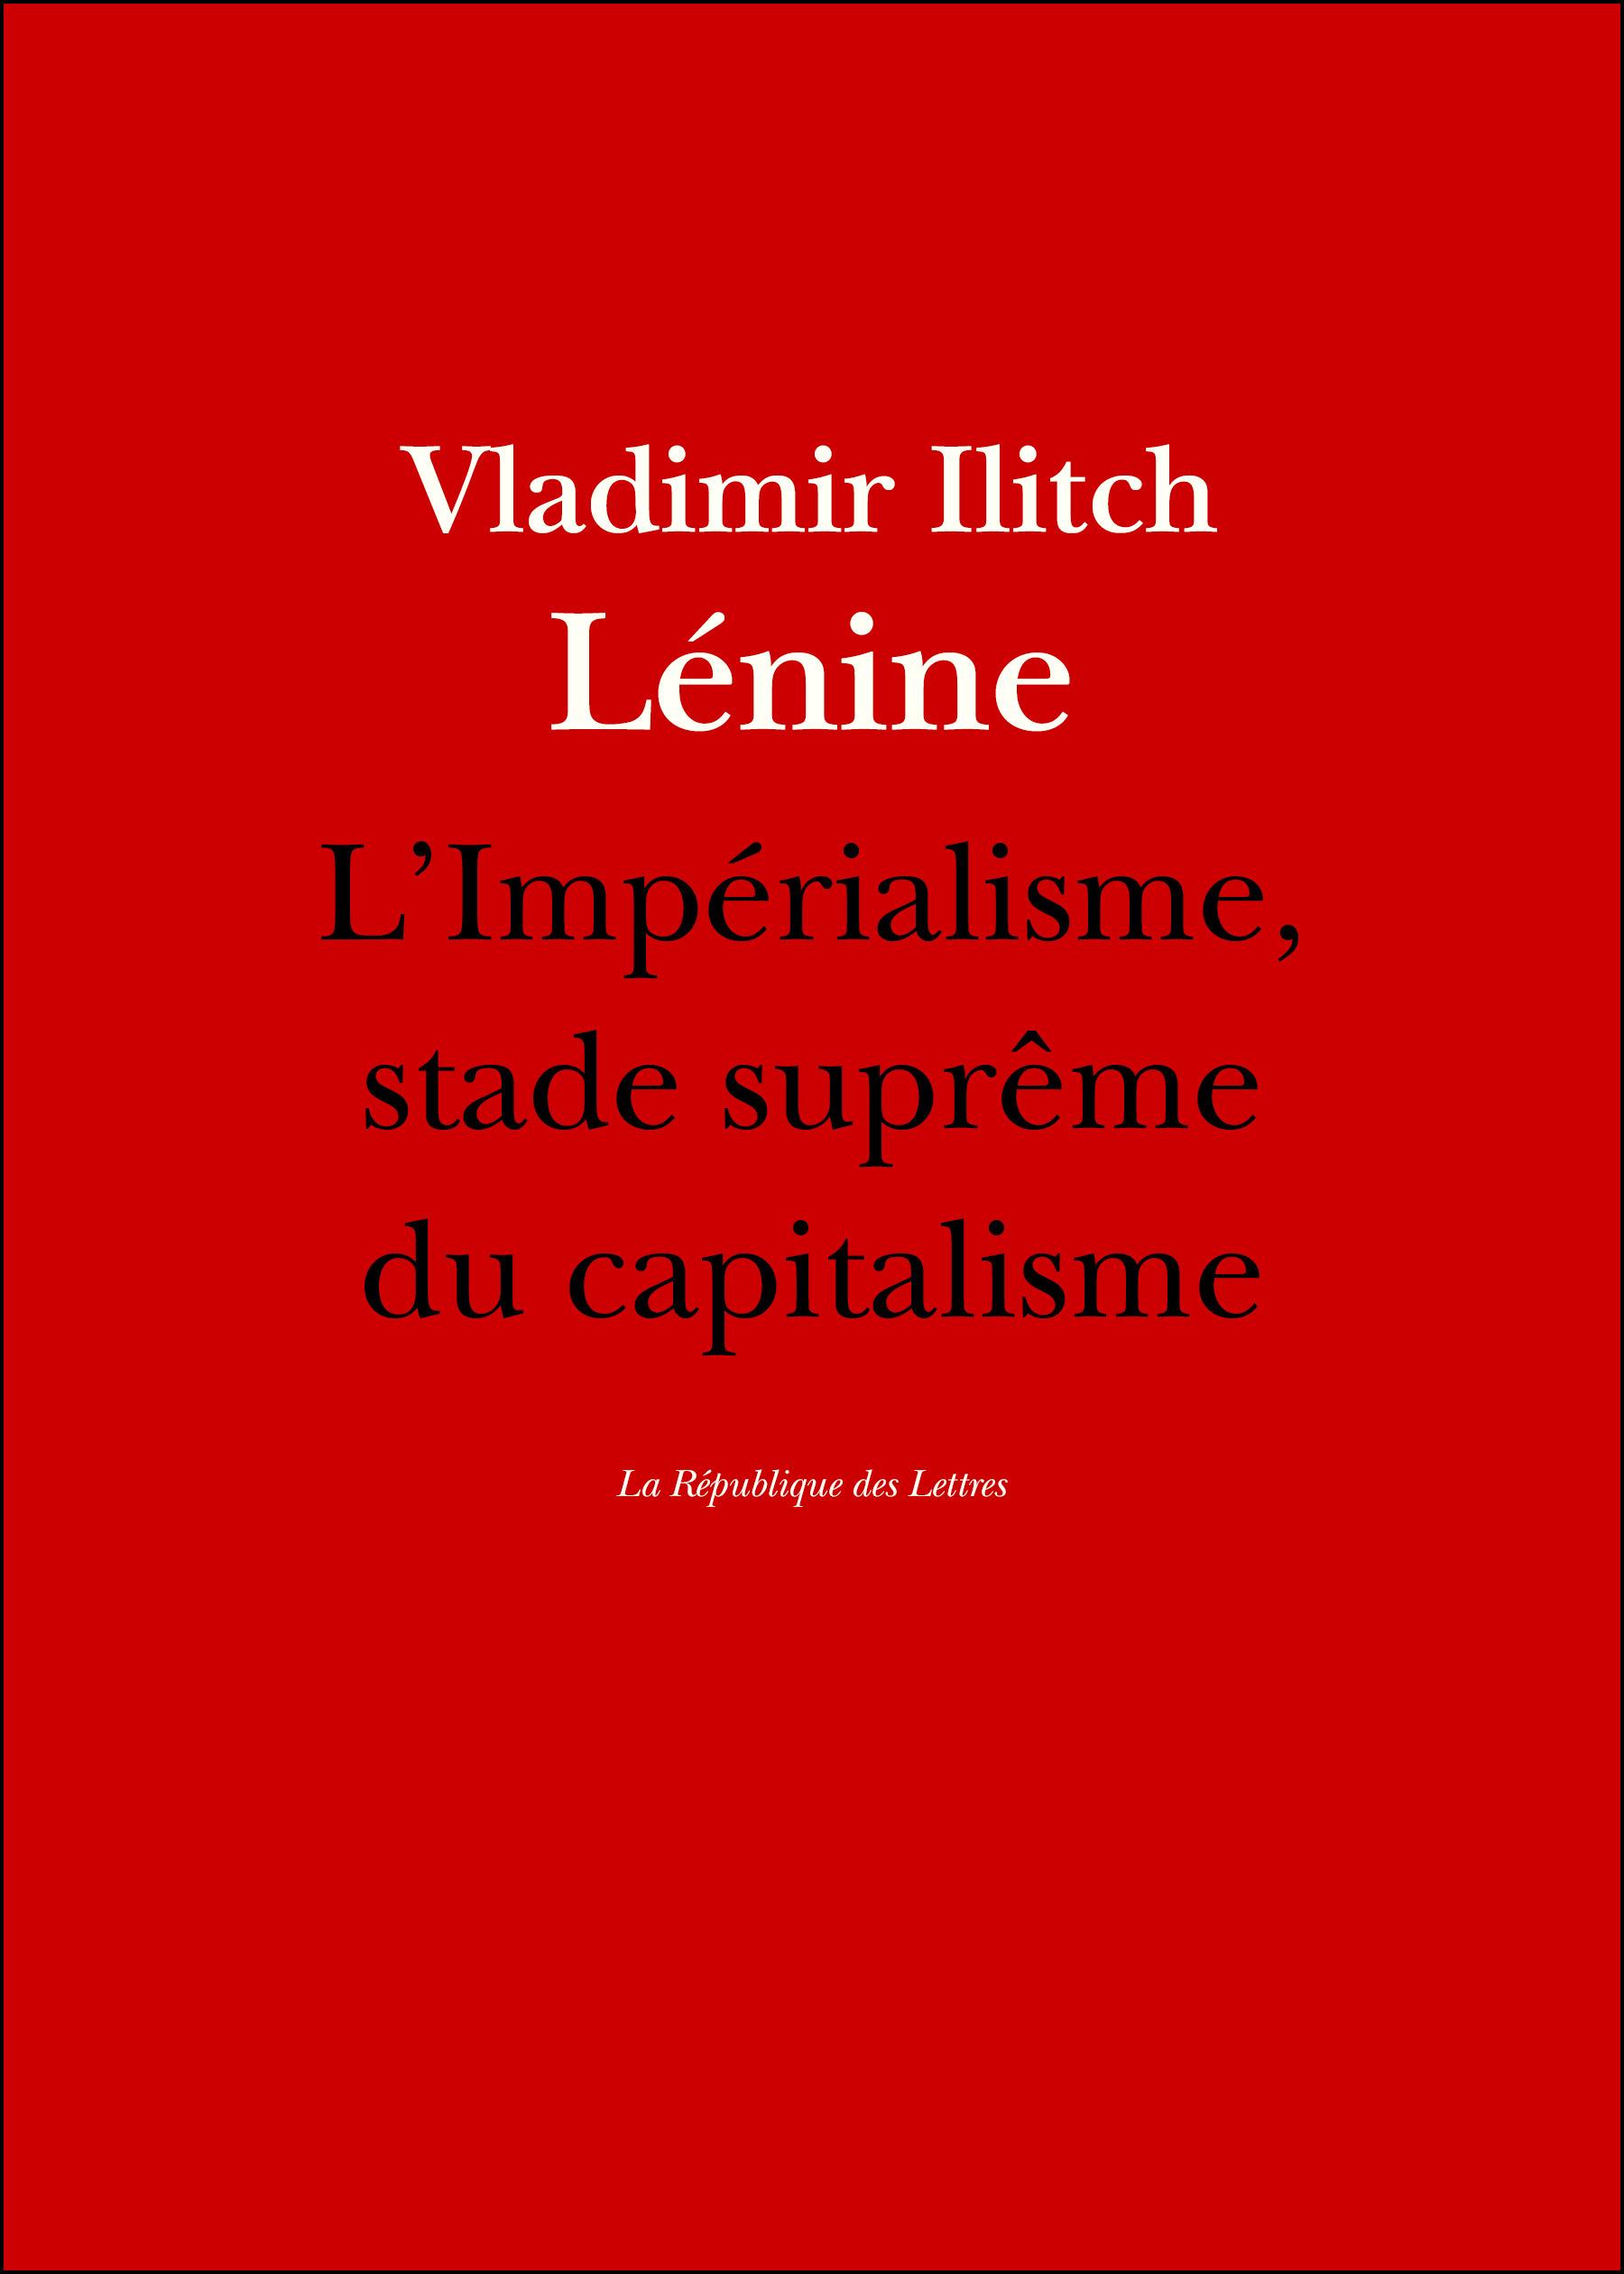 Lénine L'impérialisme, stade suprême du capitalisme